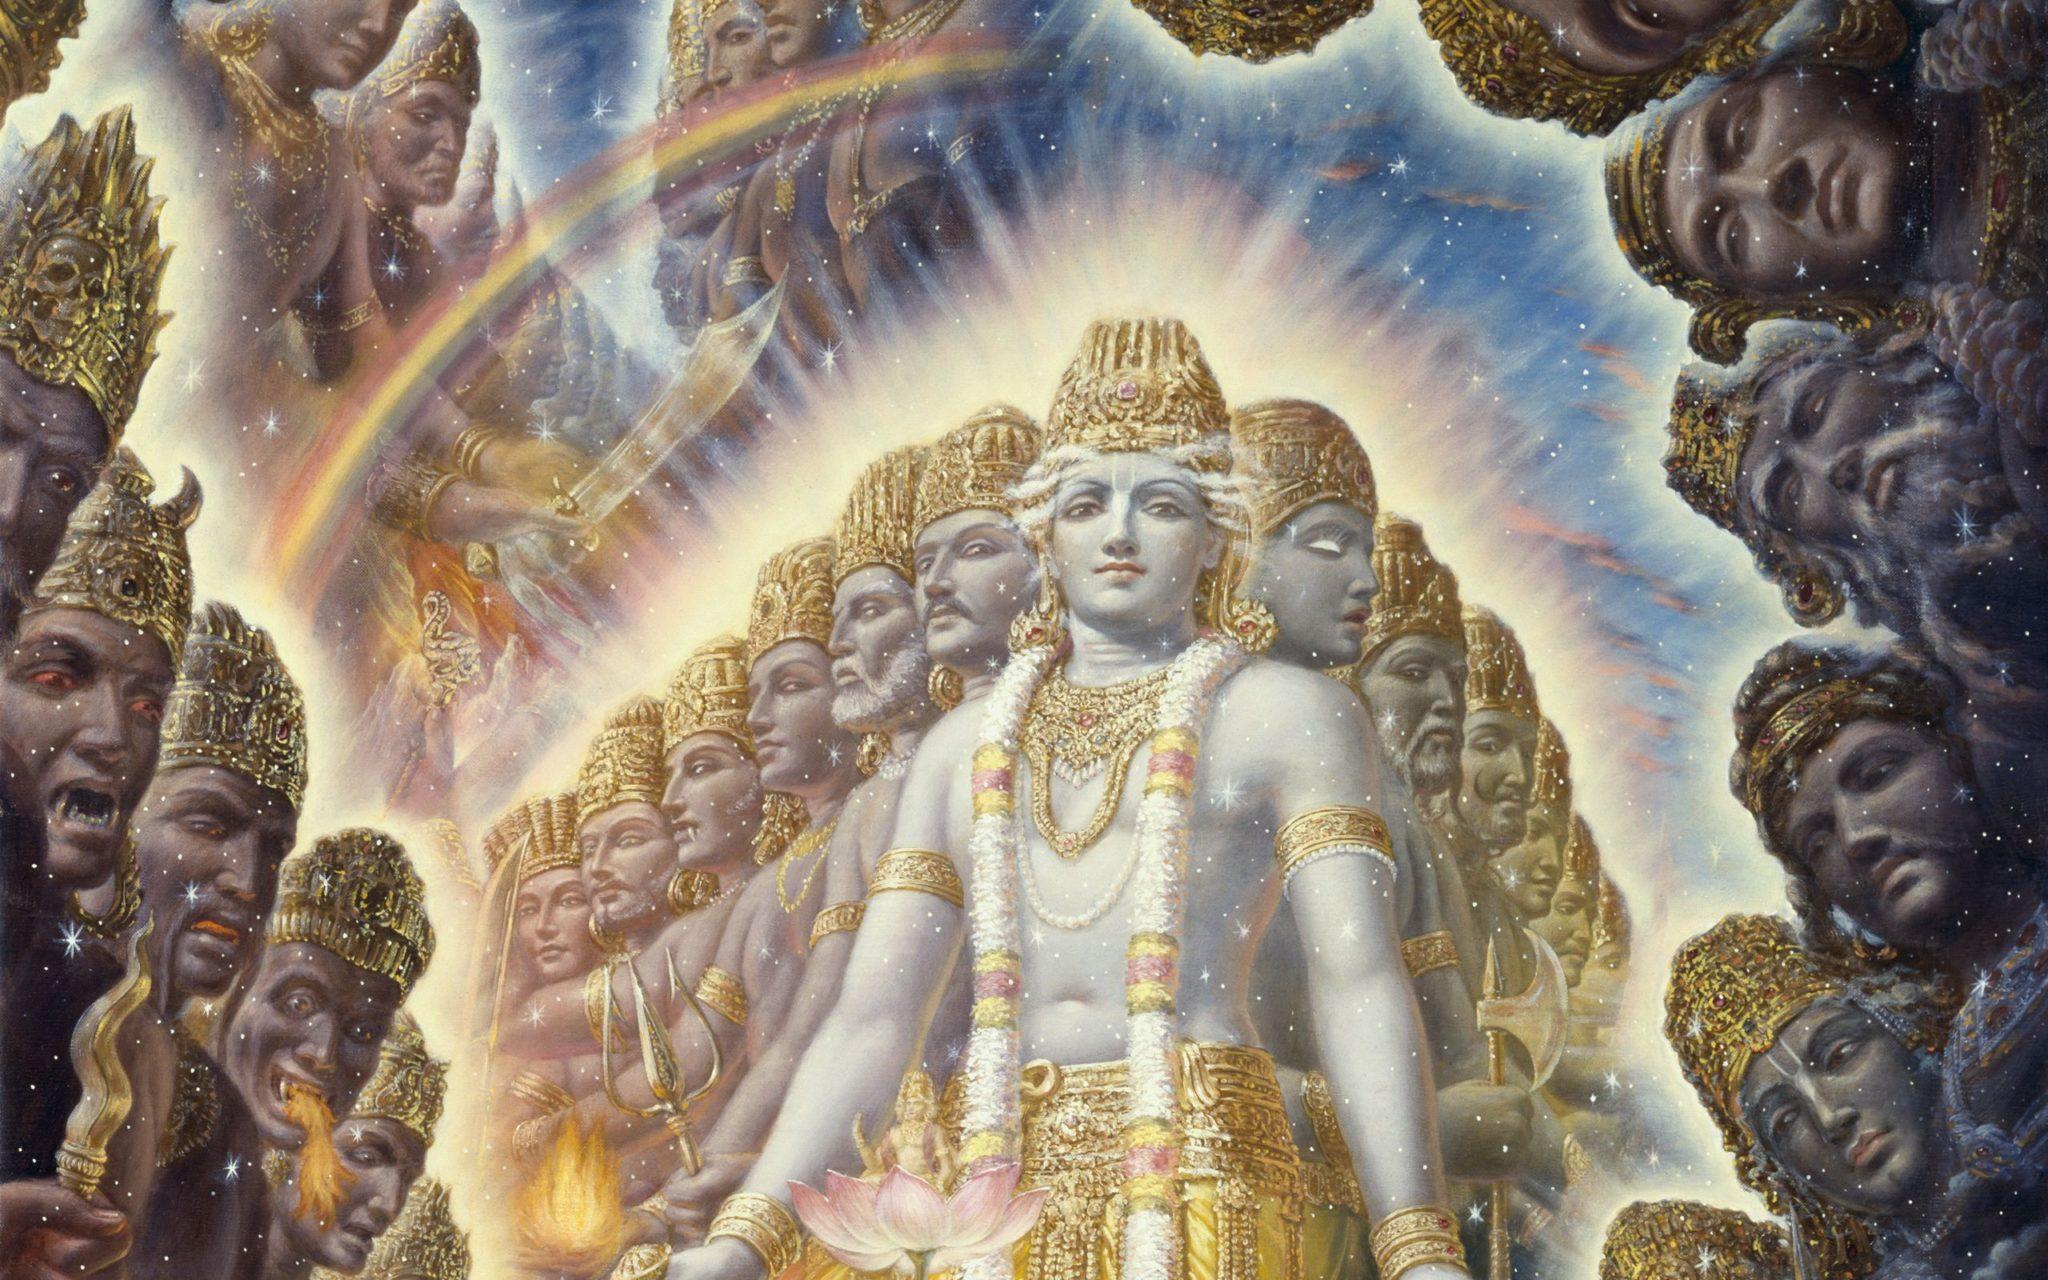 Bhagavad Gita - The Universal Form Illustration